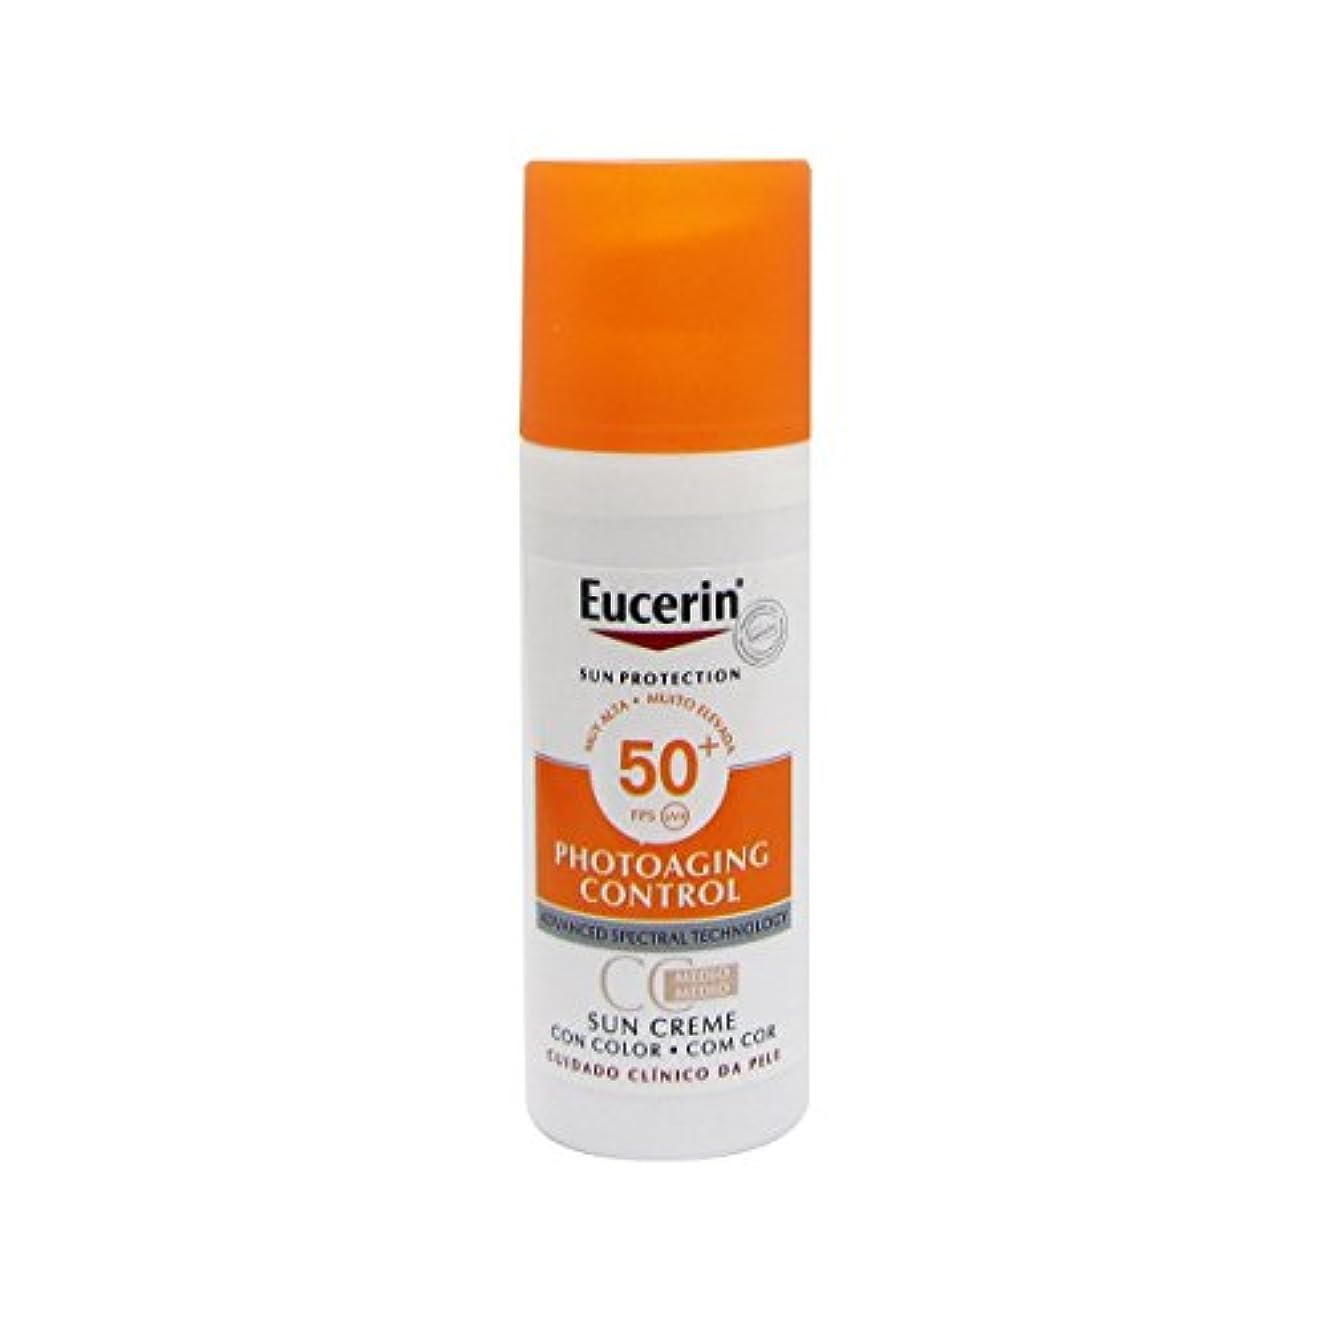 Eucerin Sun Face Tinted Cream Spf50 50ml [並行輸入品]